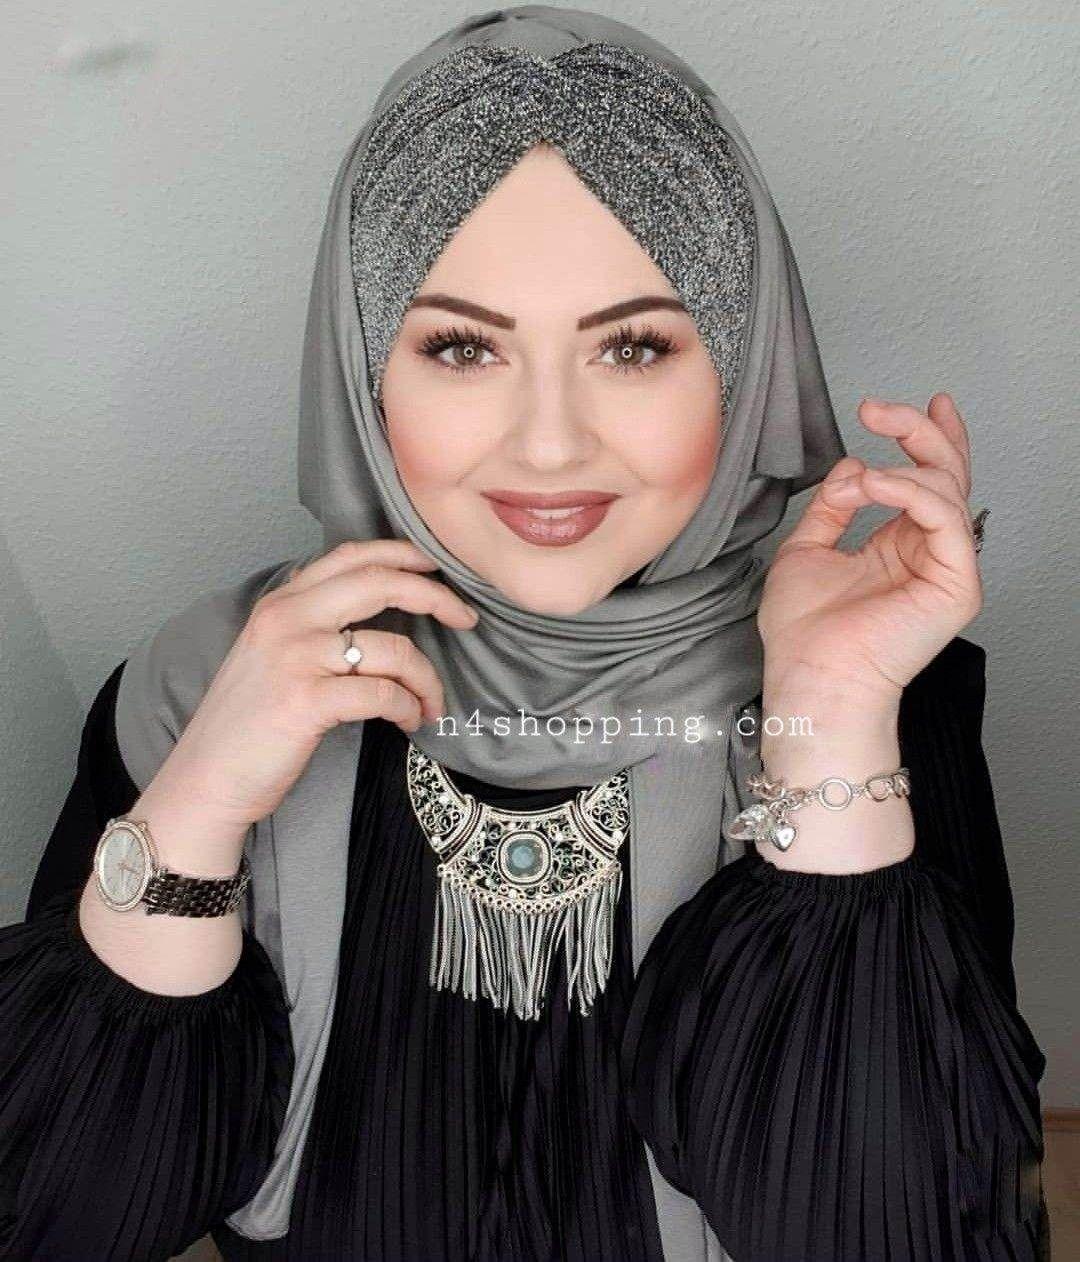 Hijab Headscarves Shawl Turban Turkishstyle Bonnet Hijabtutorial Modanisa Differenaz Tulipaturba N4shopping حجاب توربان Head Scarf Fashion Model